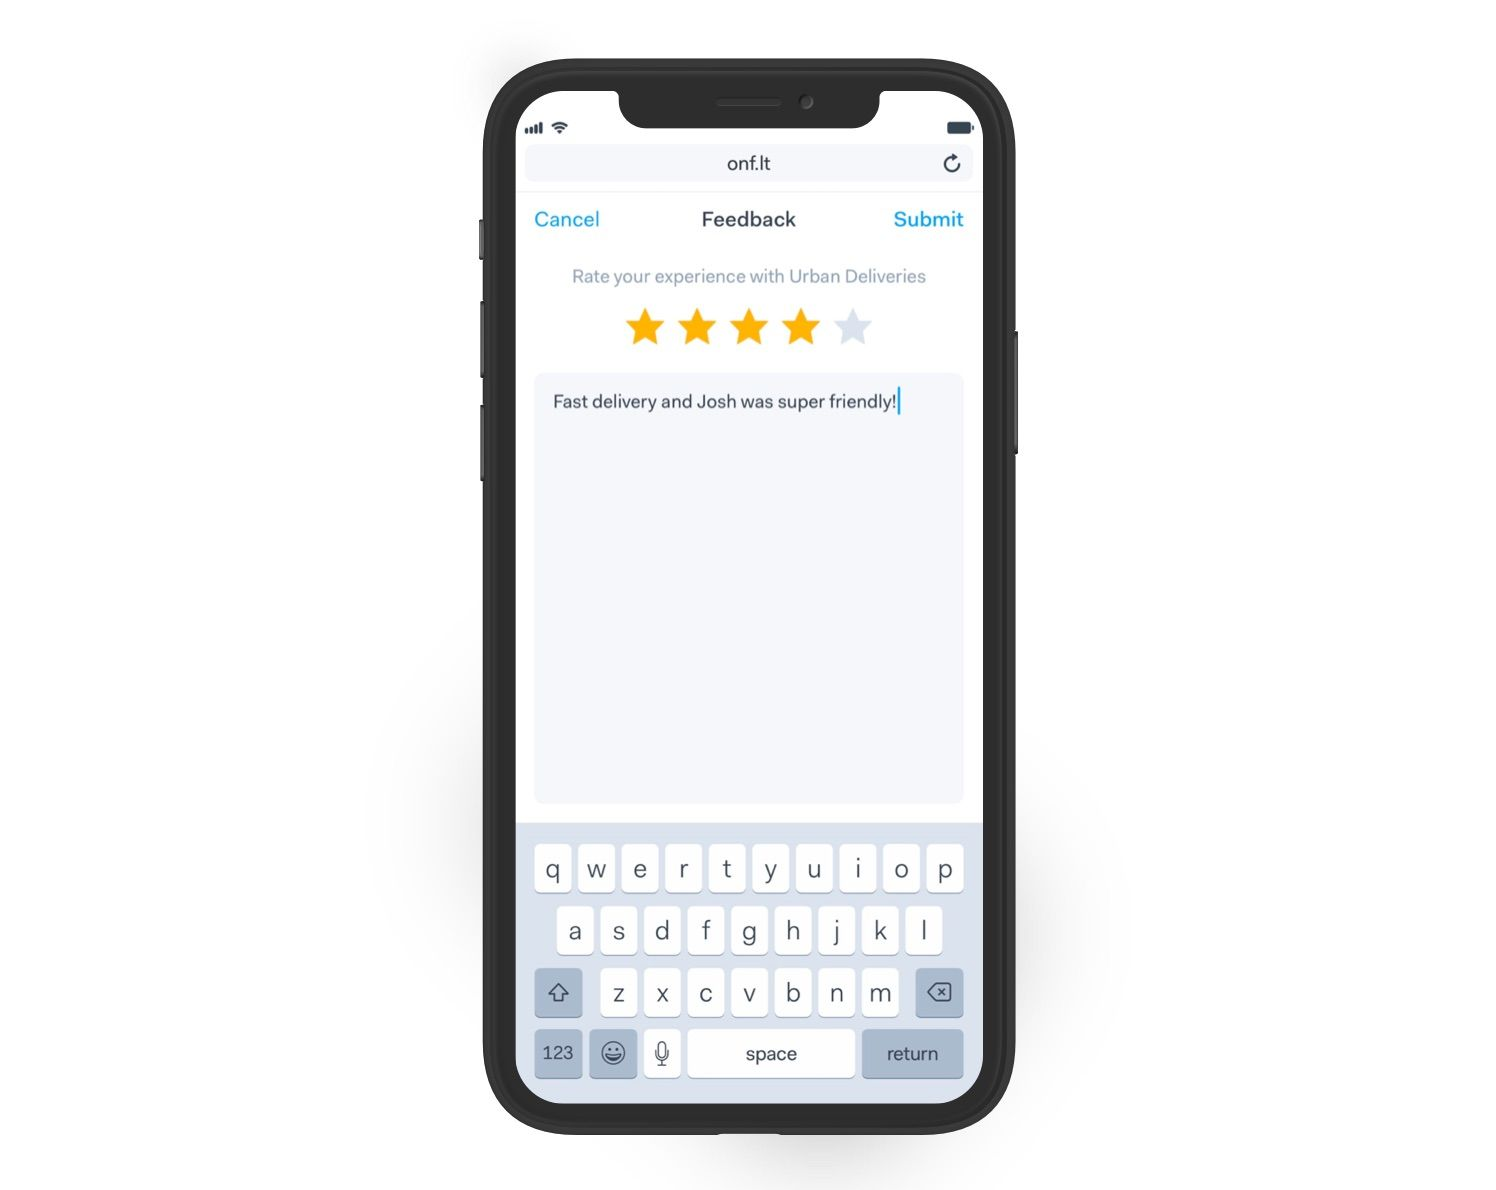 Onfleet's customer feedback collection